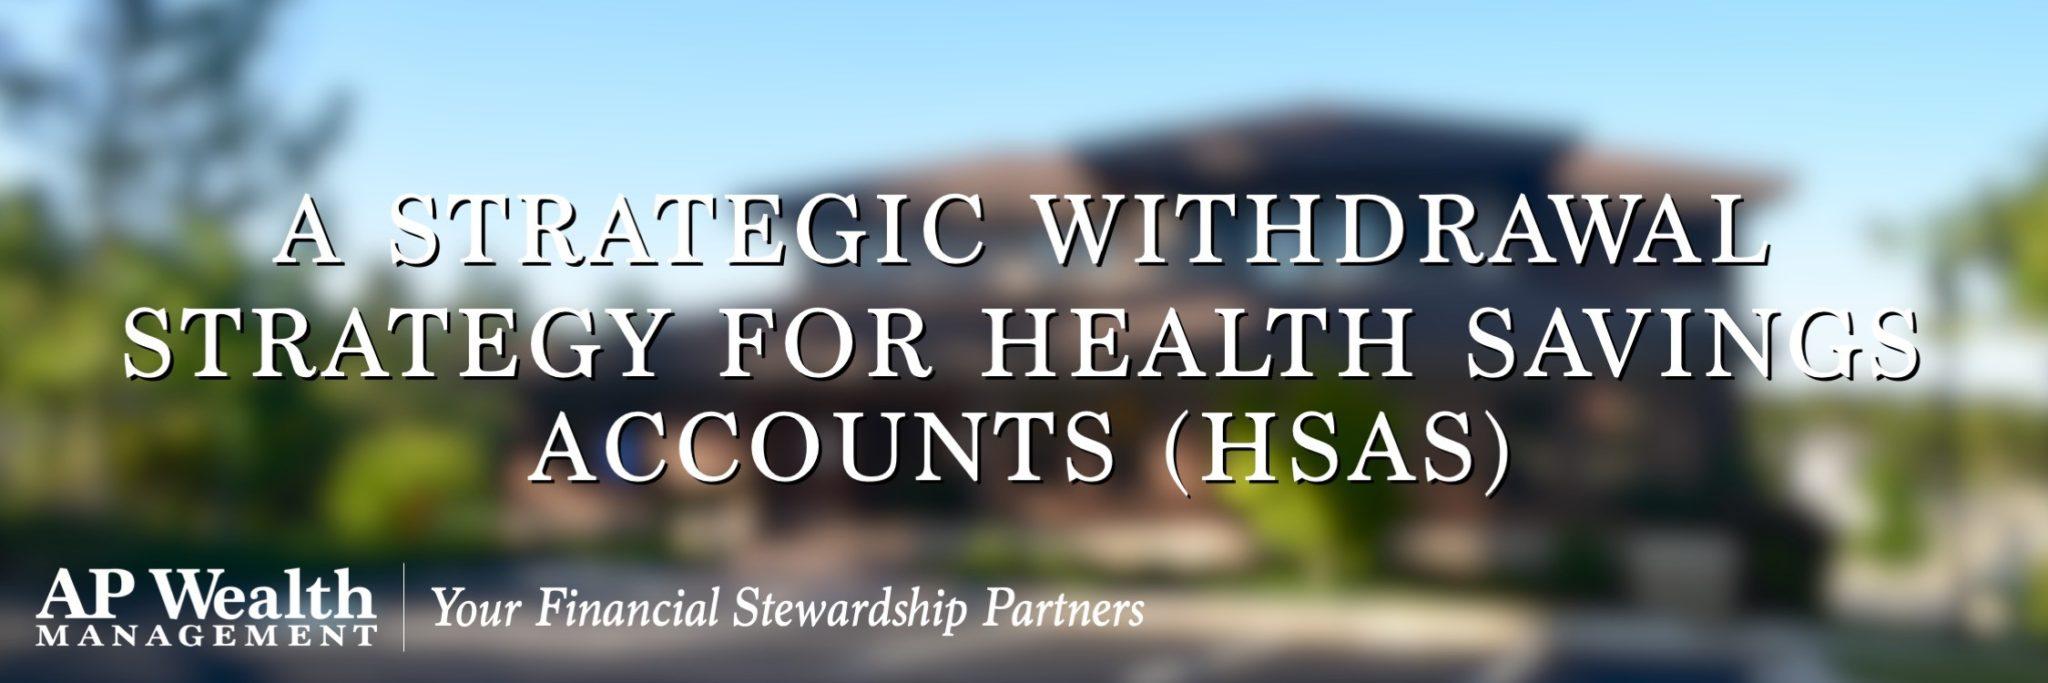 Health Savings Account Withdraw Strategy